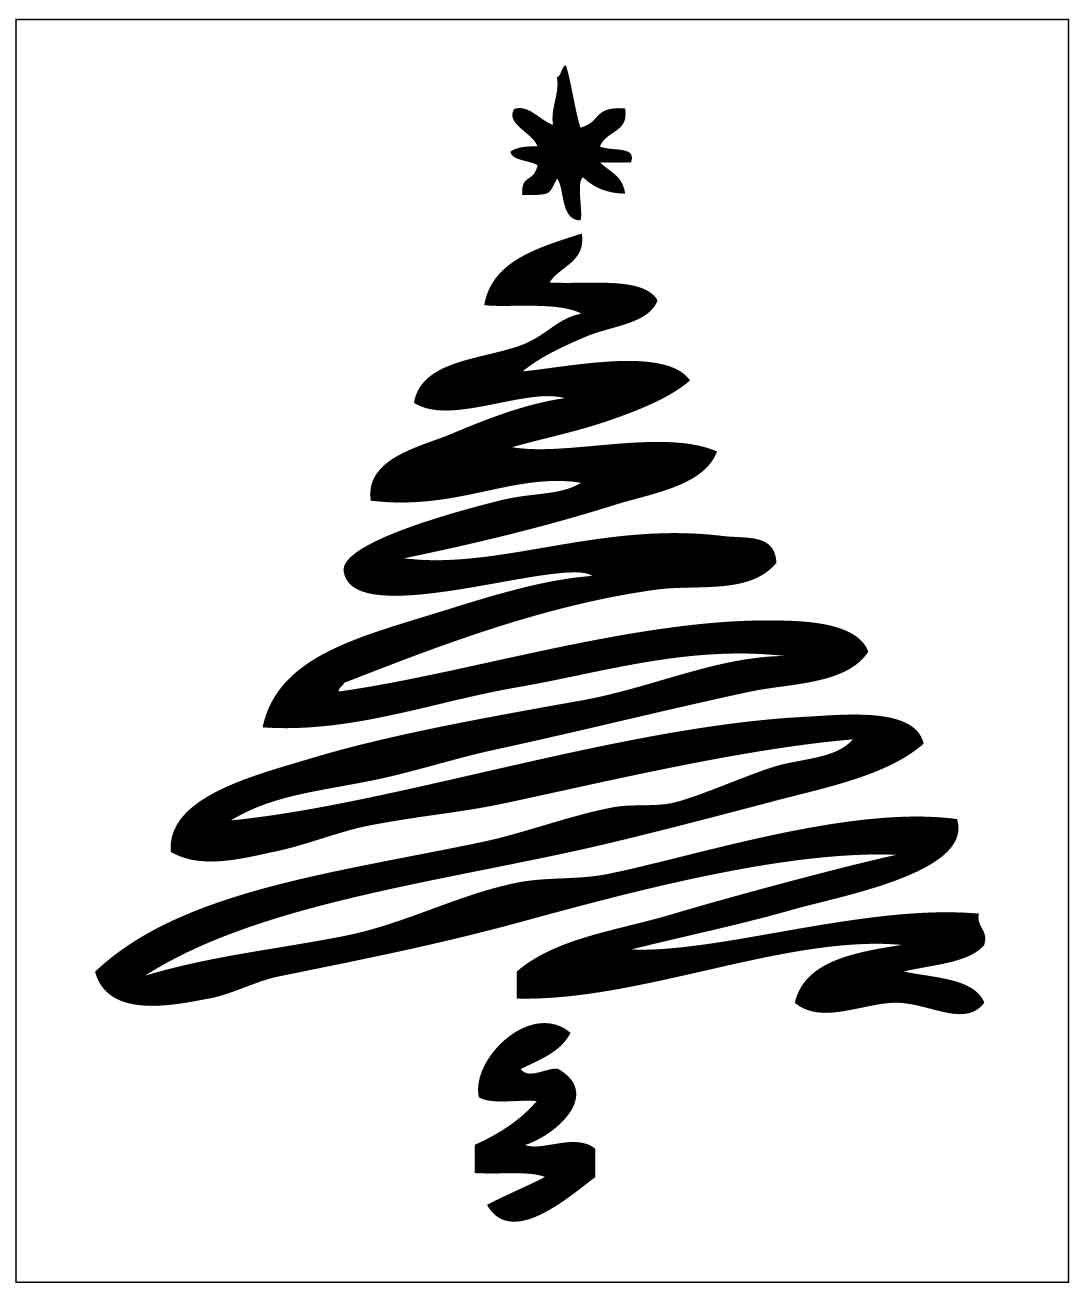 Christmas Tree Stencils: MC24 Reusable Laser-Cut Stencil Christmas Tree